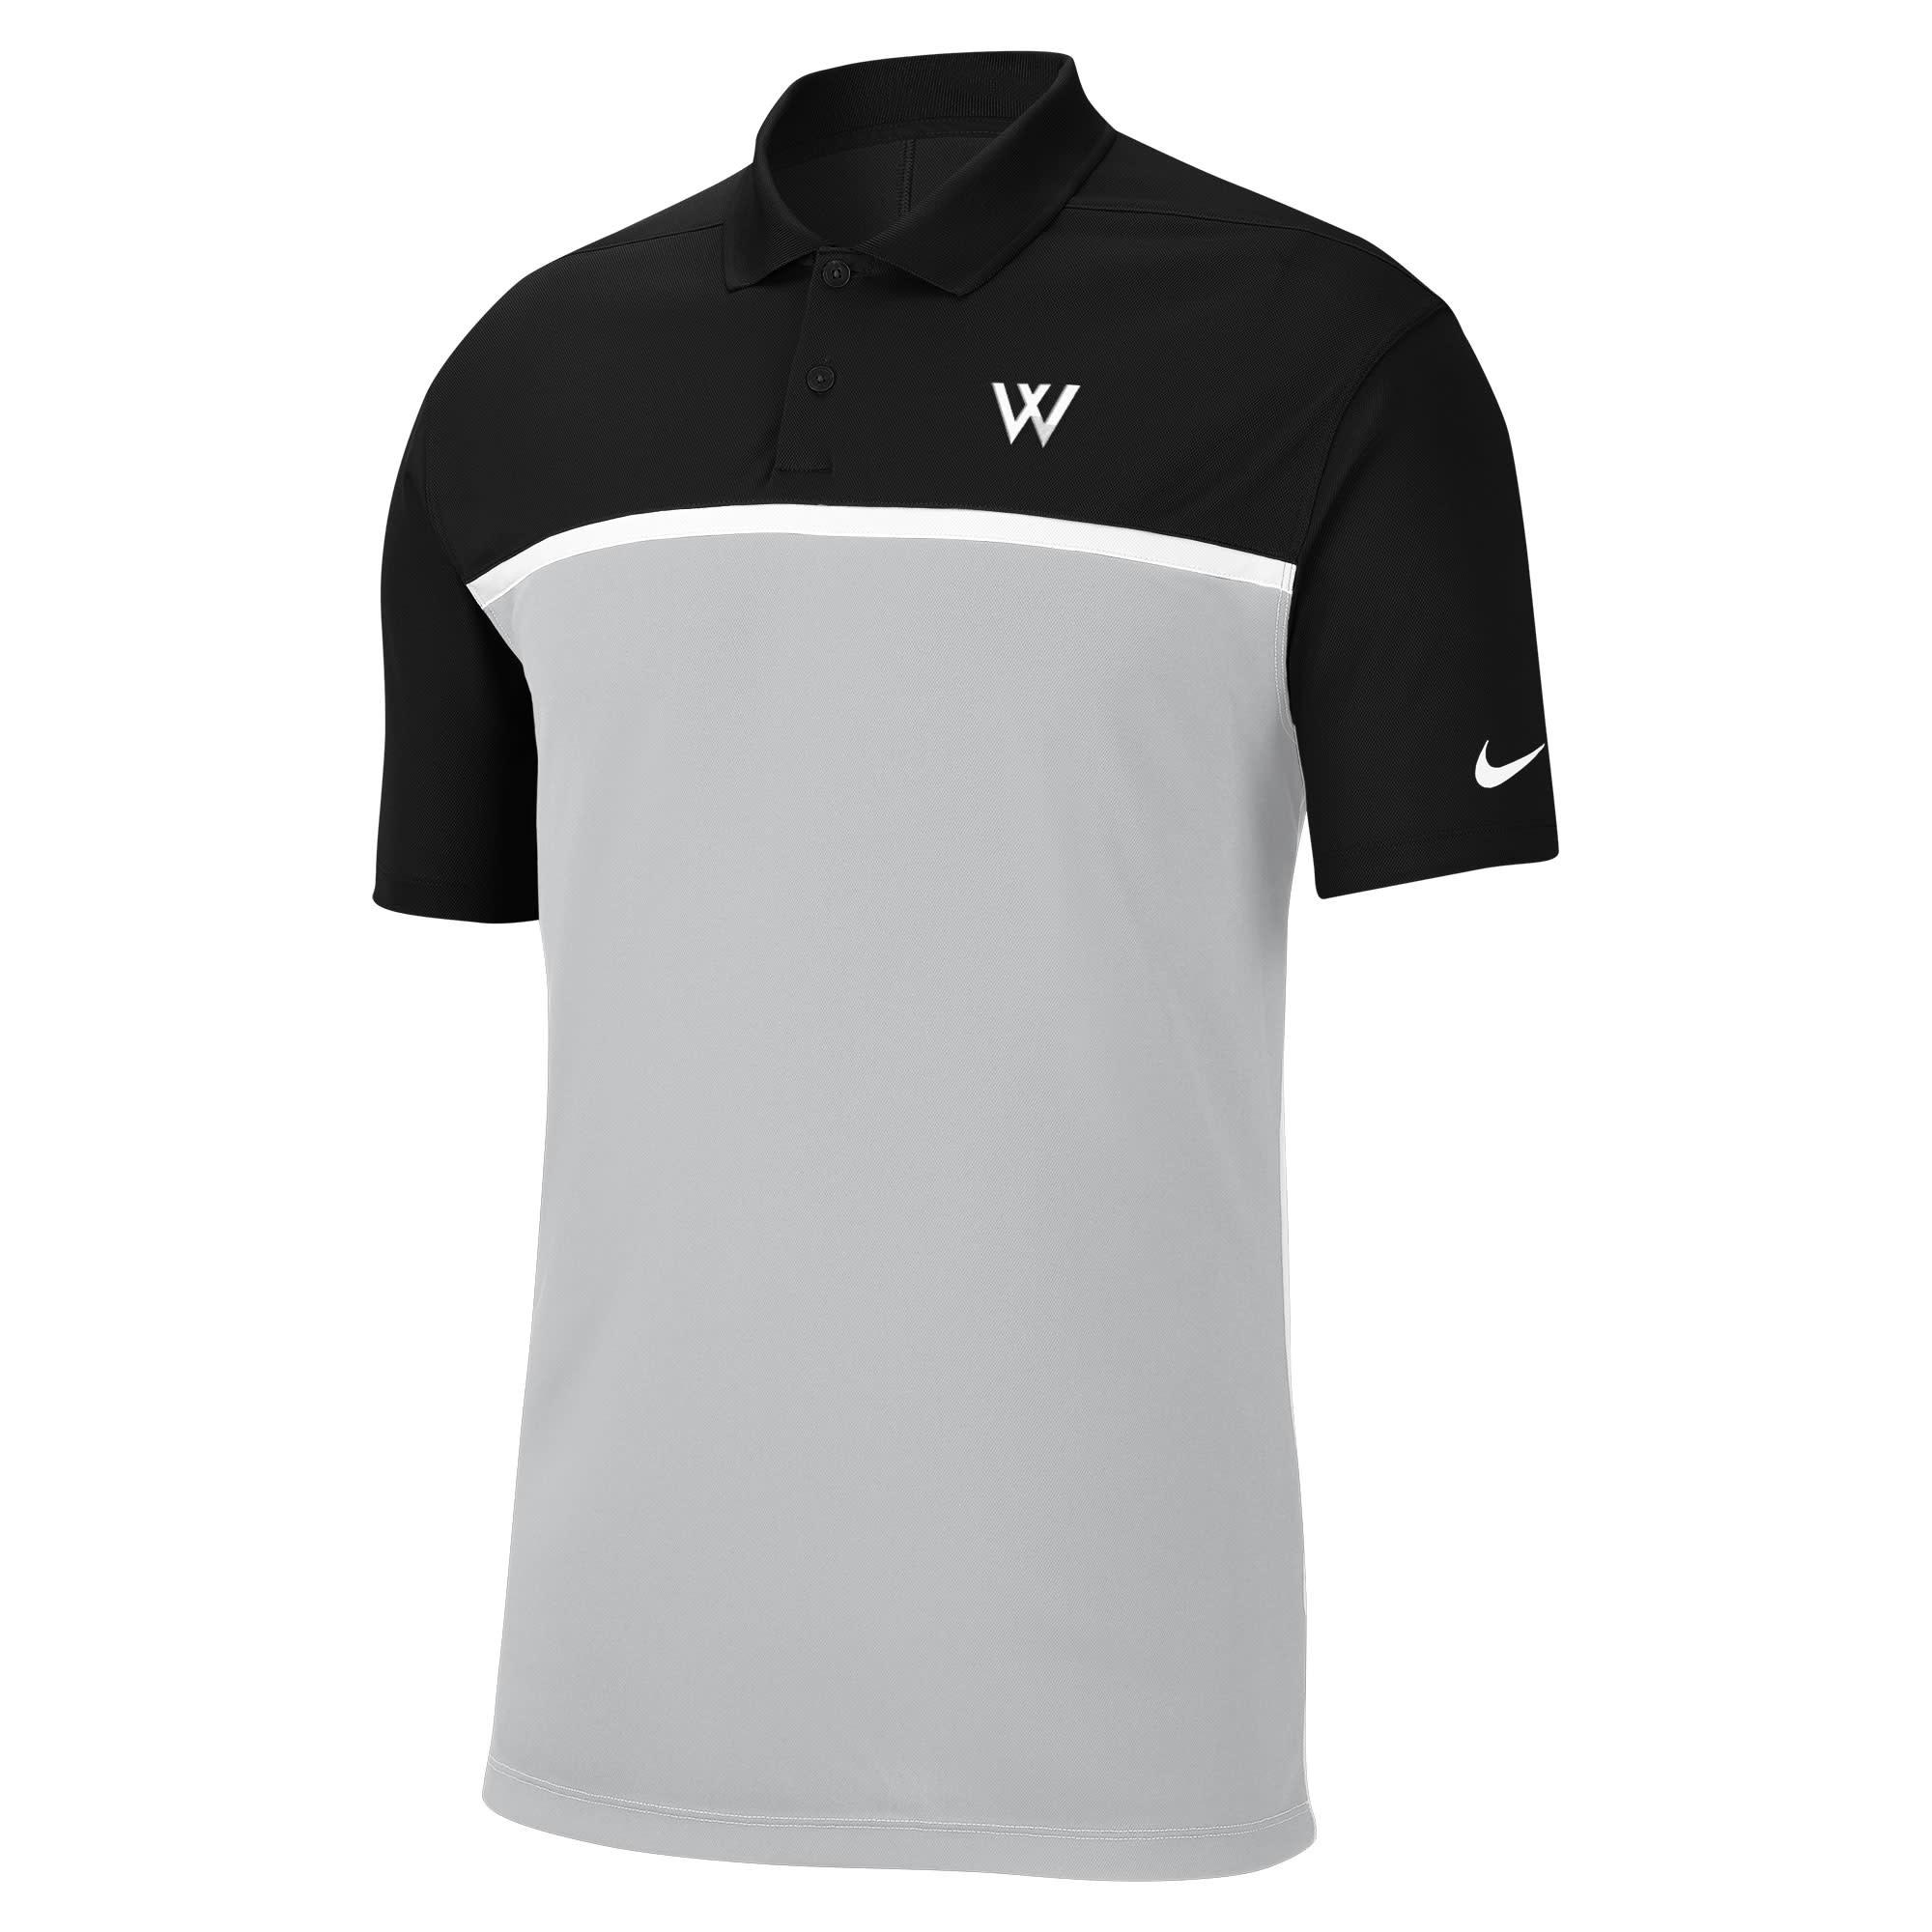 Nike Polo: Nike Victory Colorblock - Black/Light Gray w/White Stripe